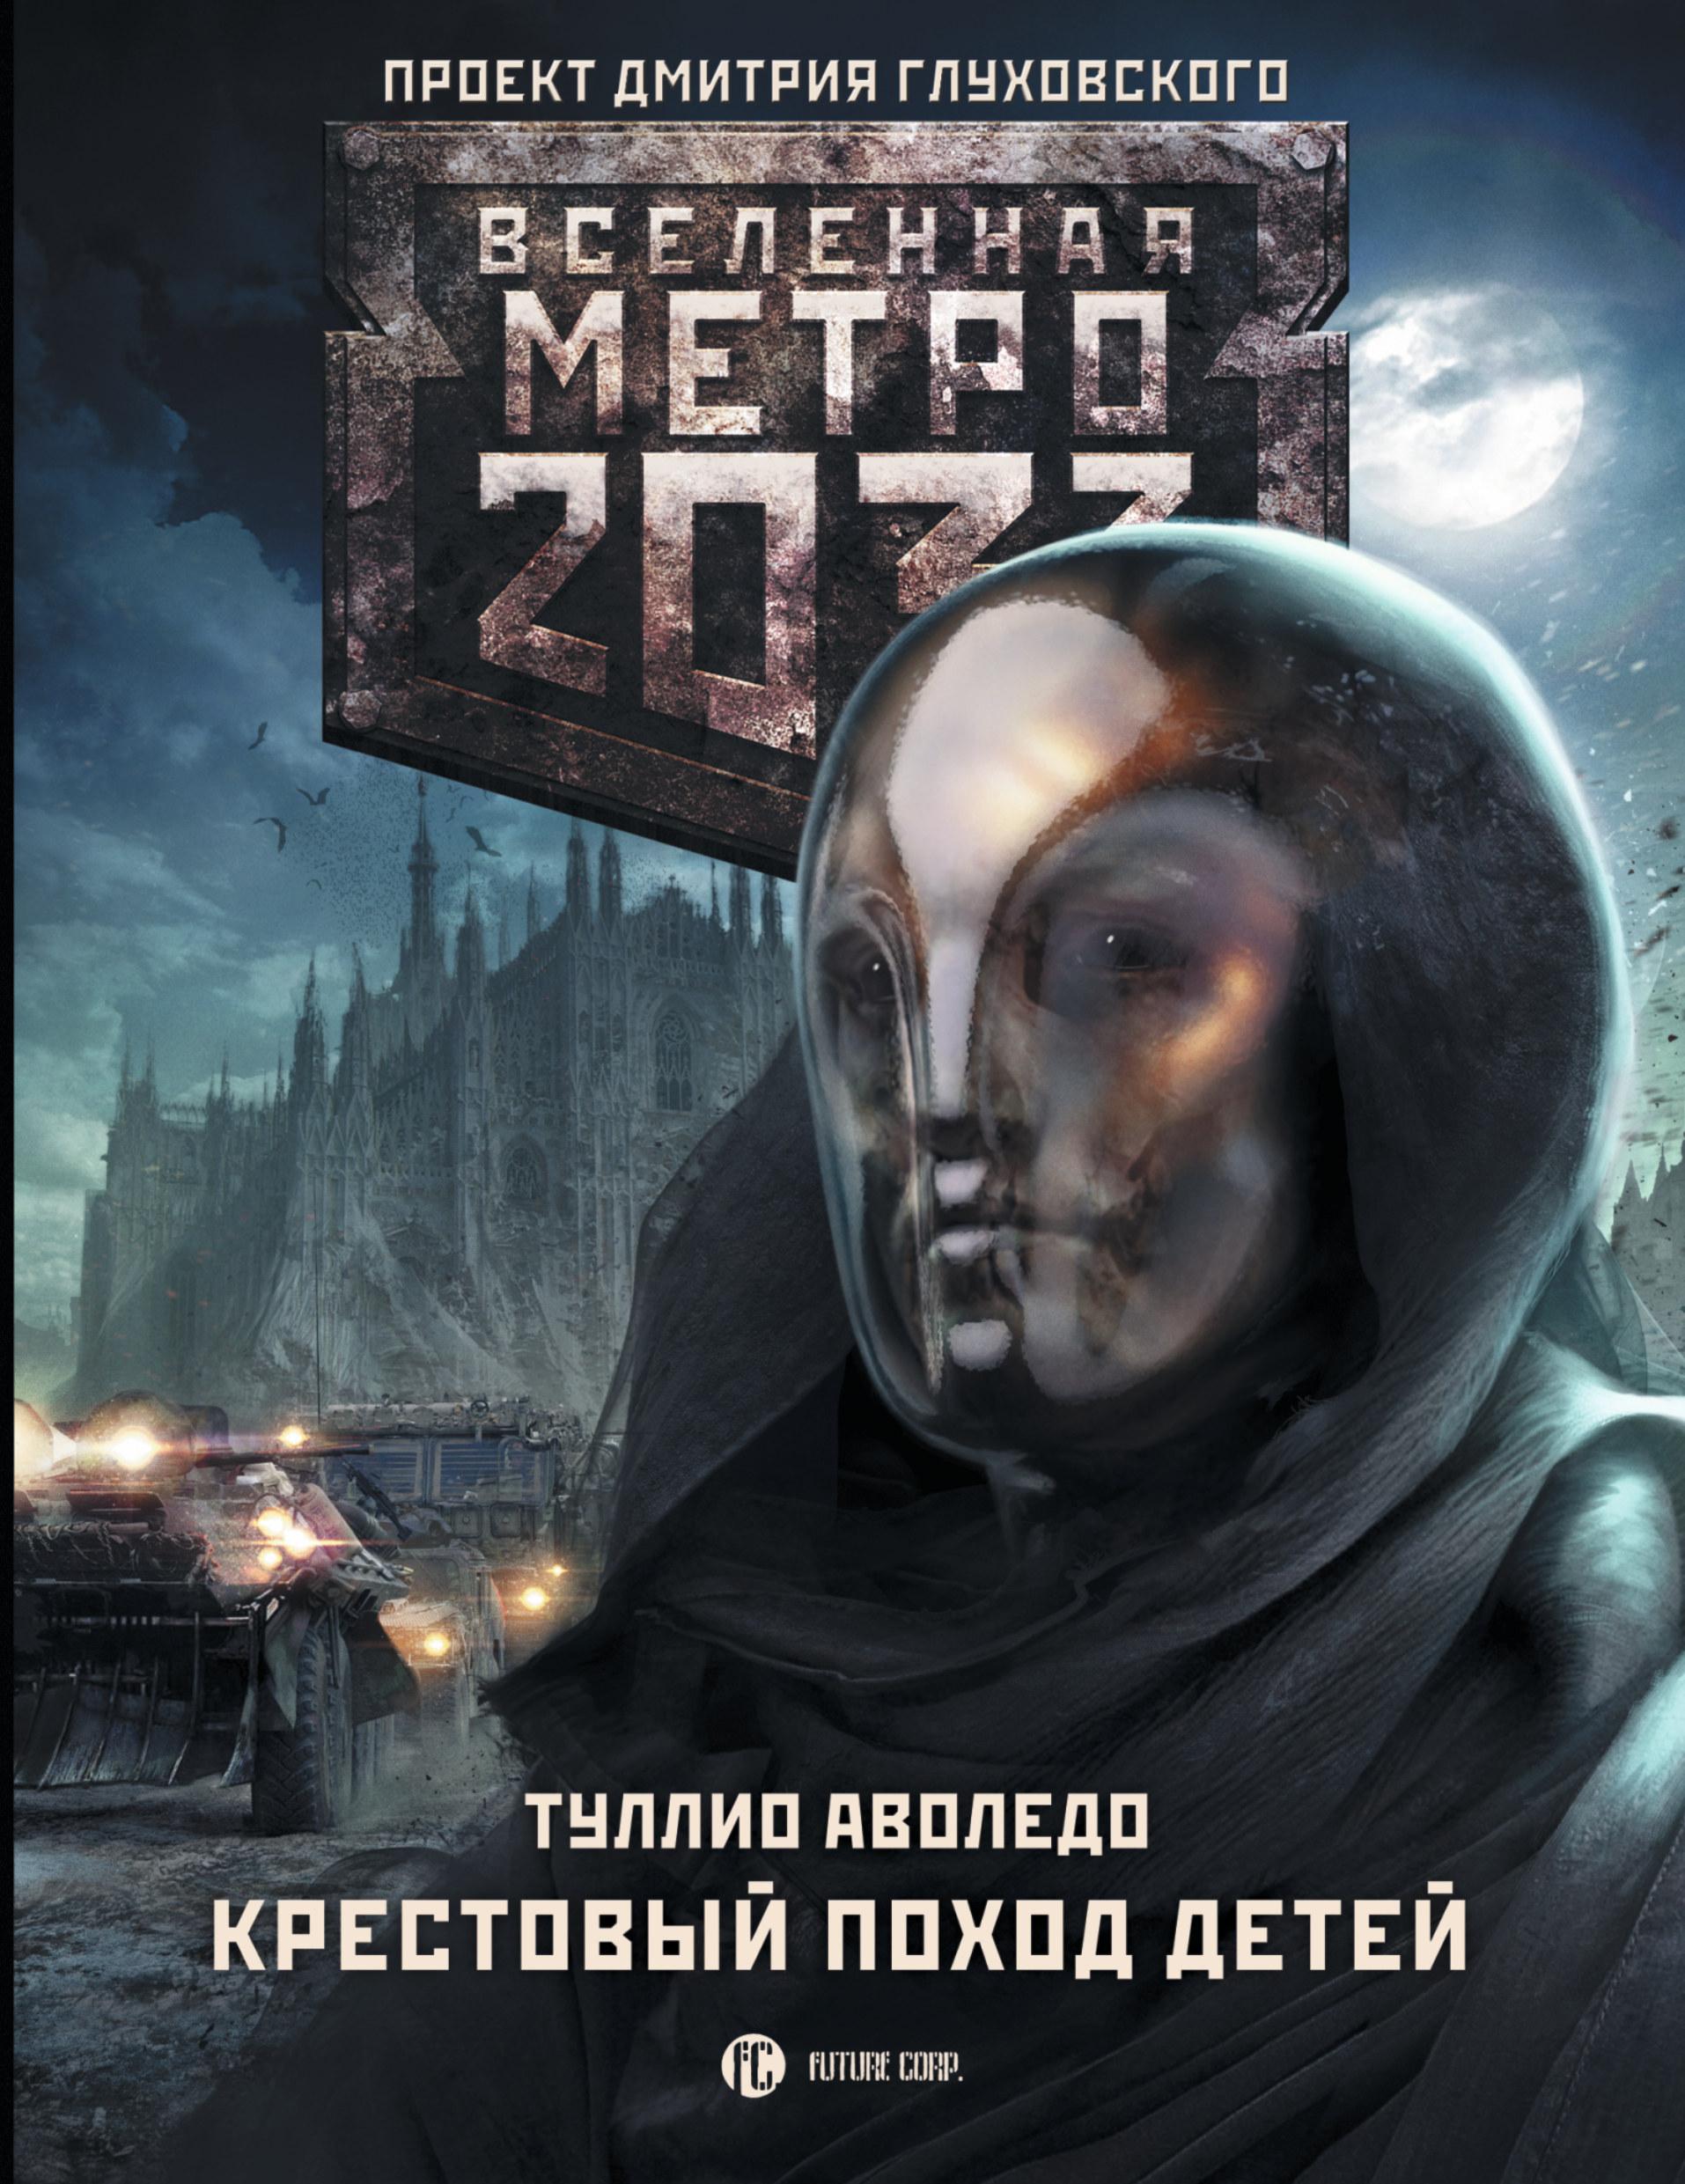 Аволедо Т. Метро 2033: Крестовый поход детей шабалов д метро 2033 право на жизнь